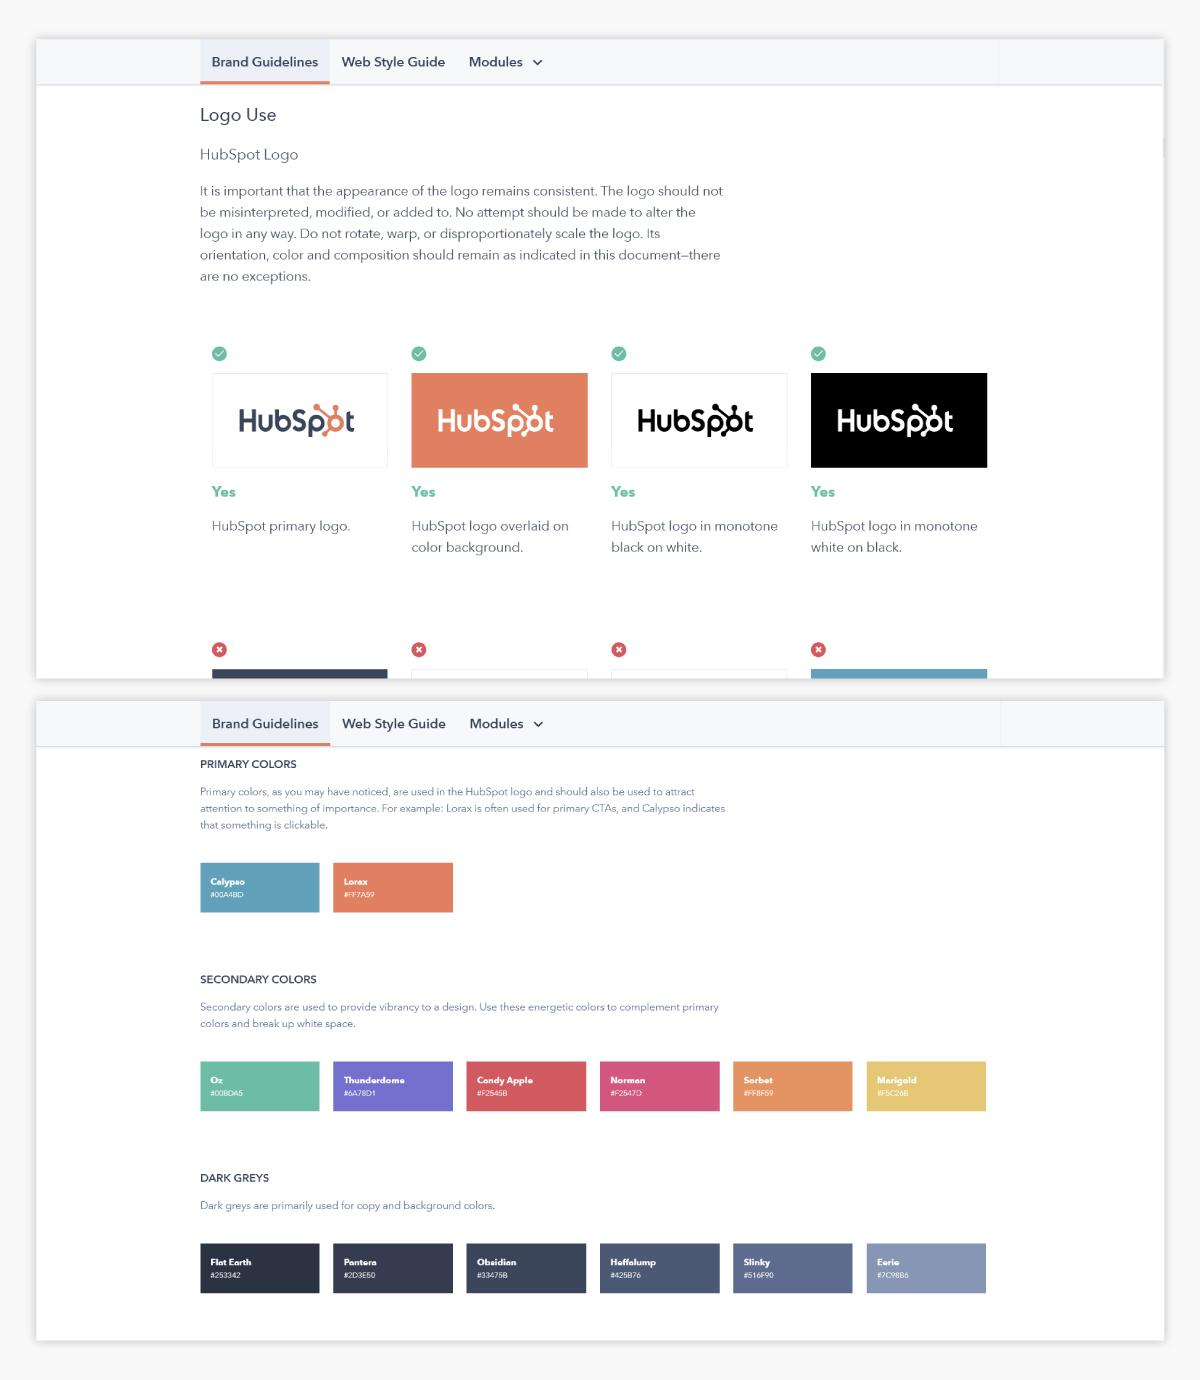 A screenshot of HubSpot's brand guidelines.